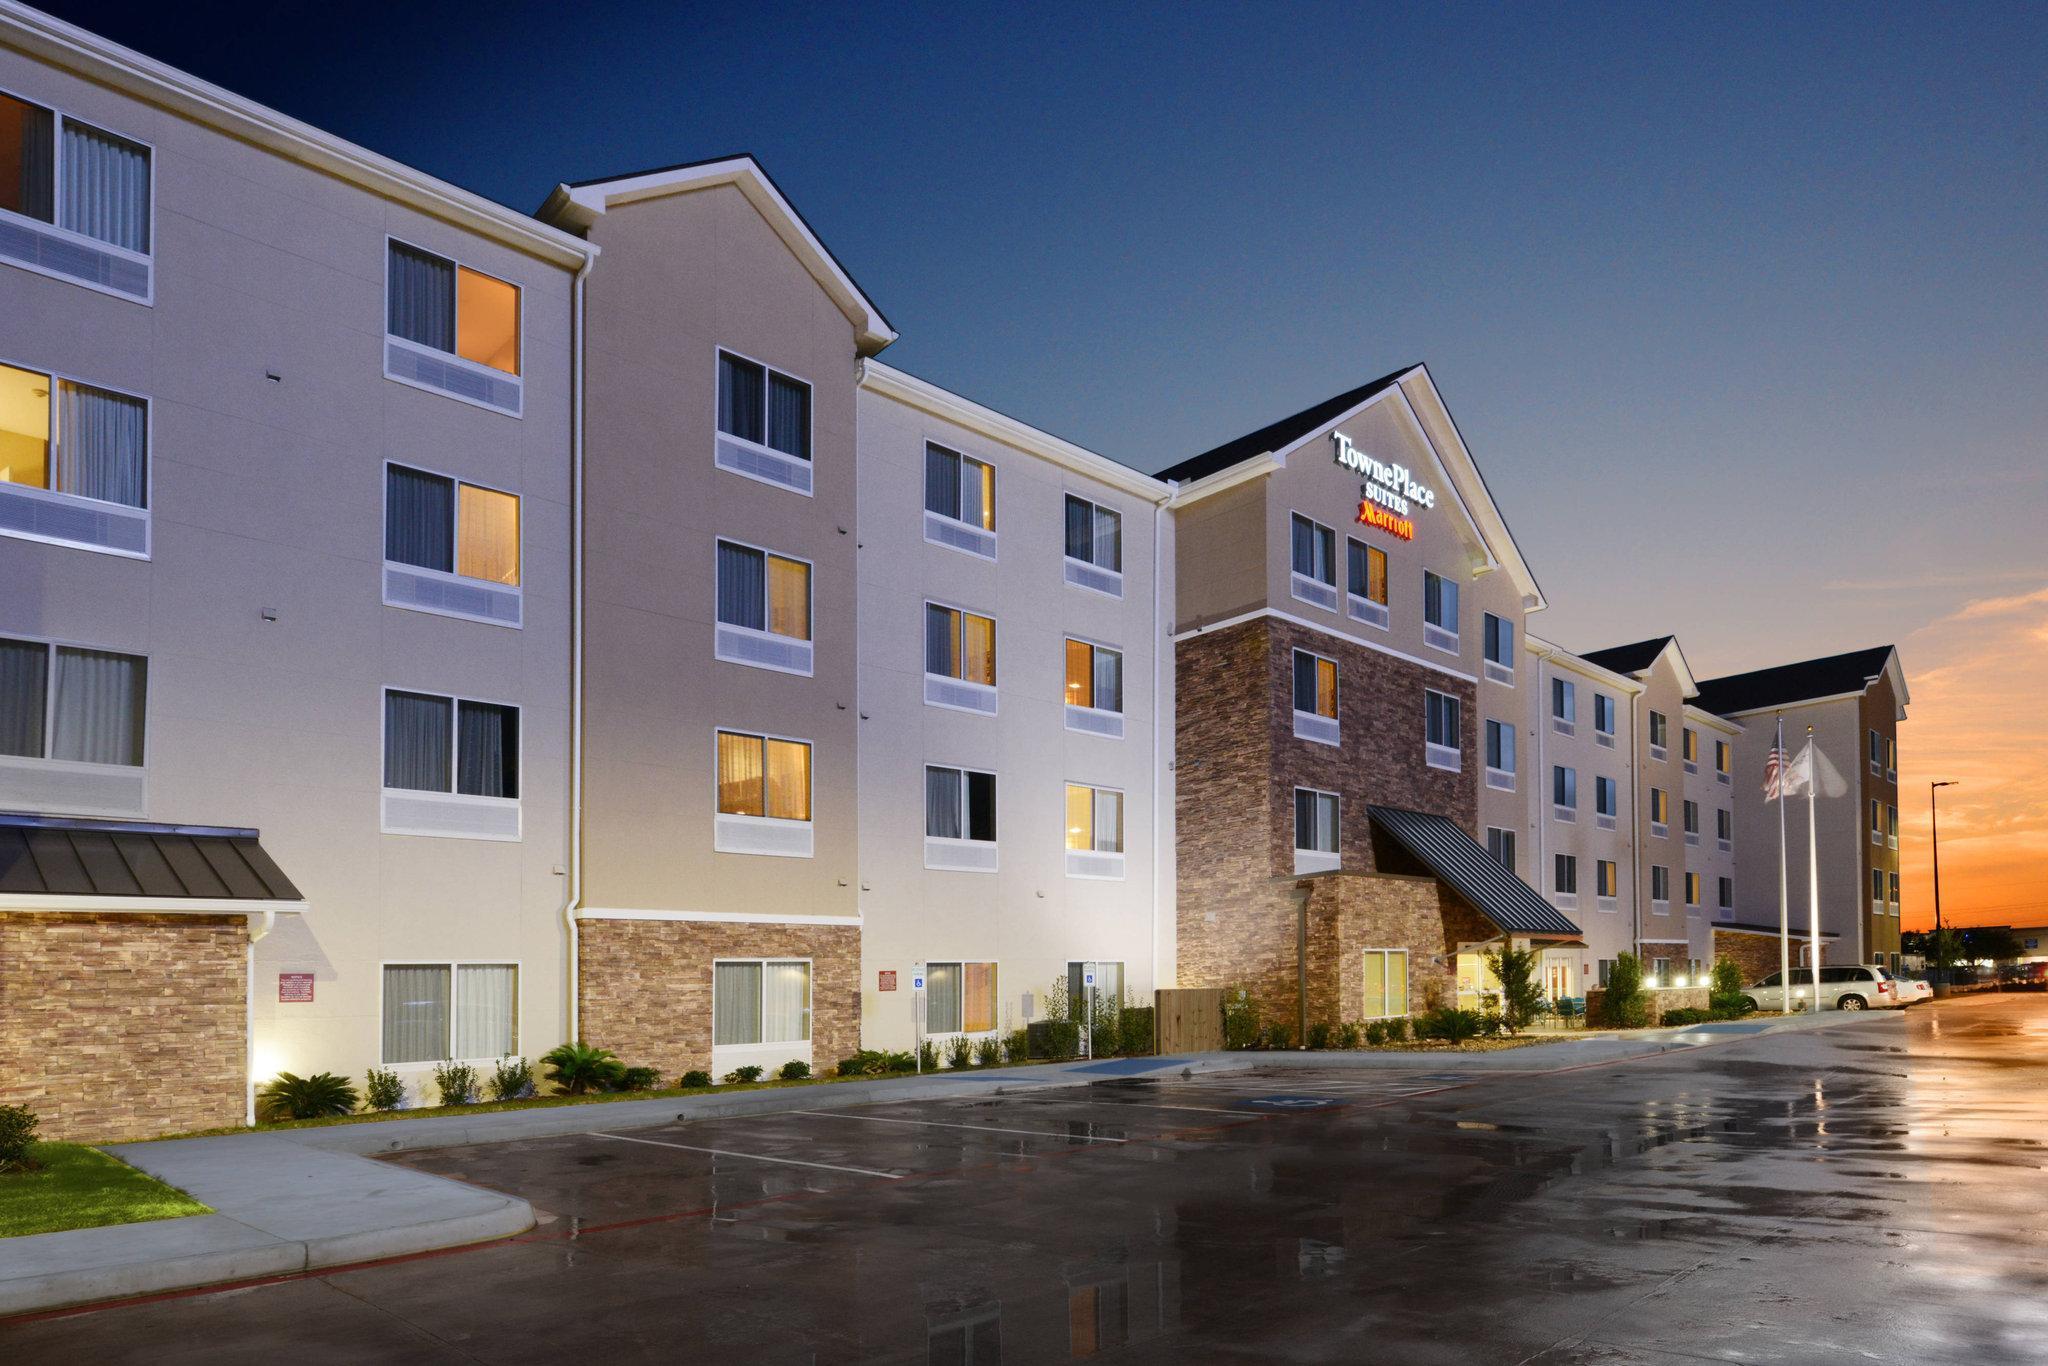 TownePlace Suites Houston Galleria Area